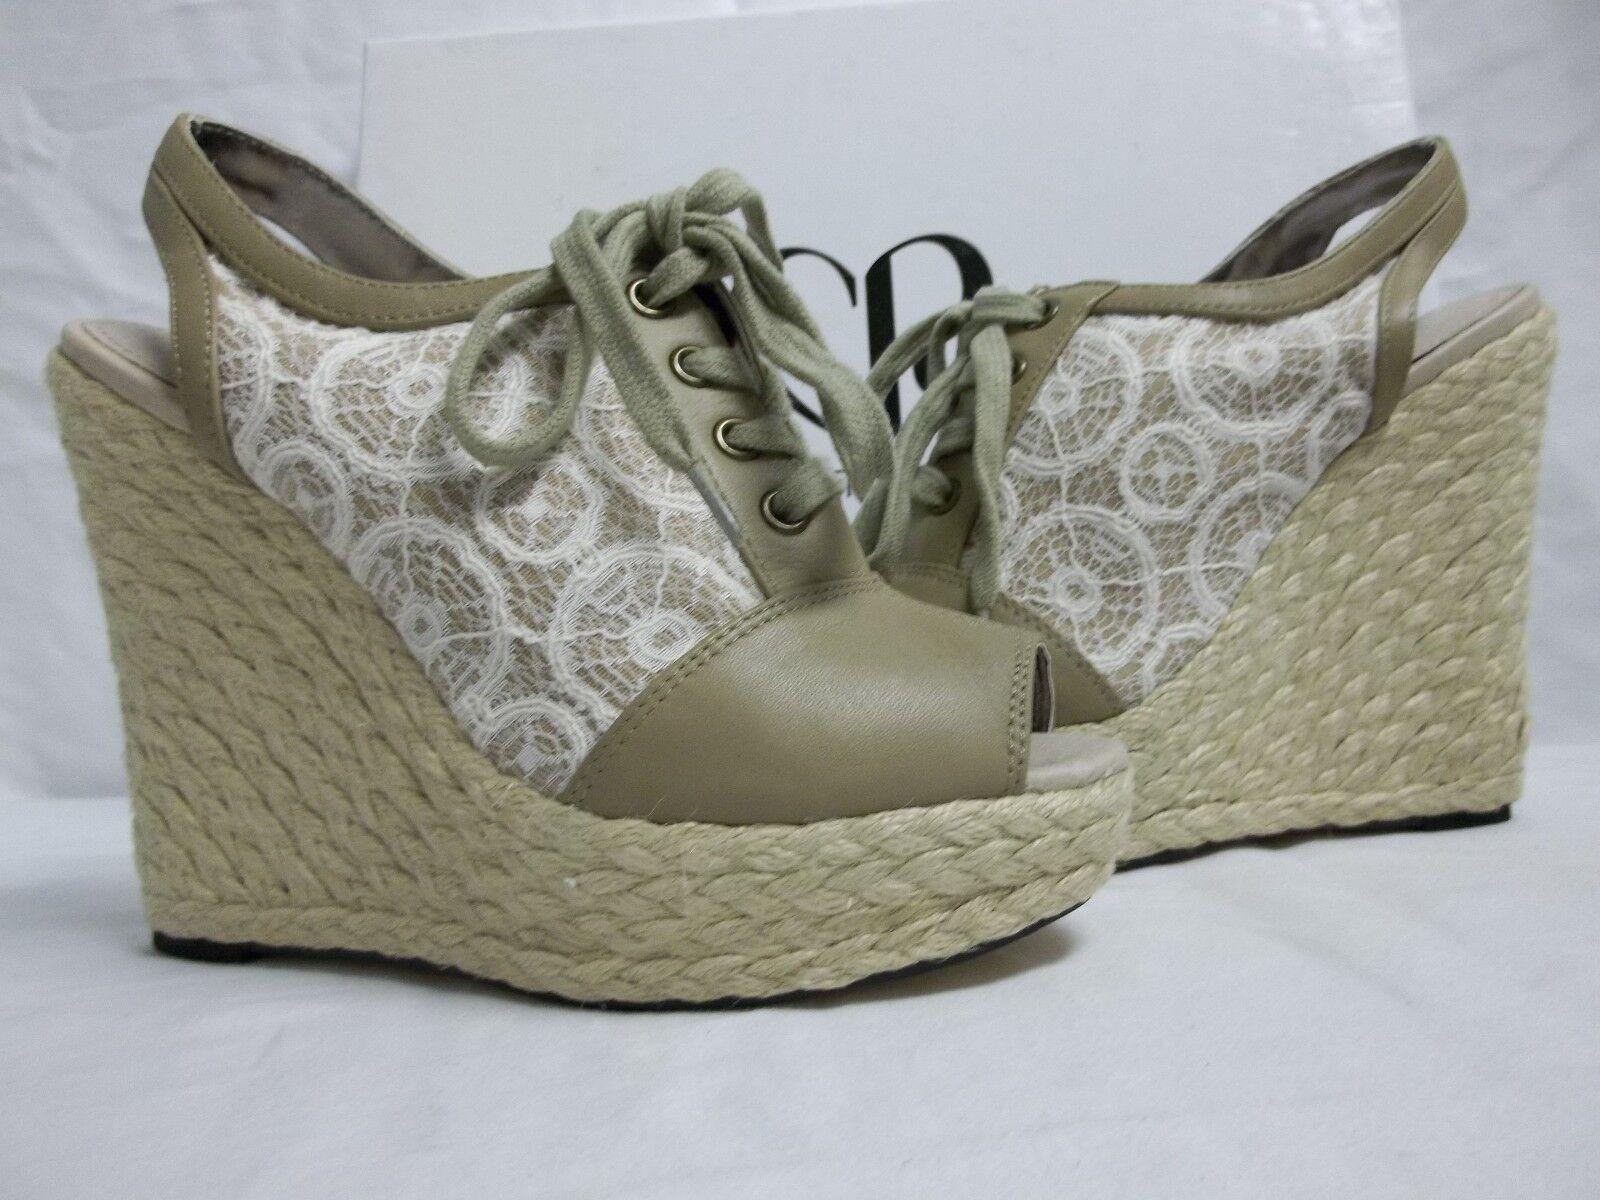 Charlotte Ronson Größe 7.5 M Hazel Taupe Ivory Open Toe Wedges NEU Damenschuhe Schuhes